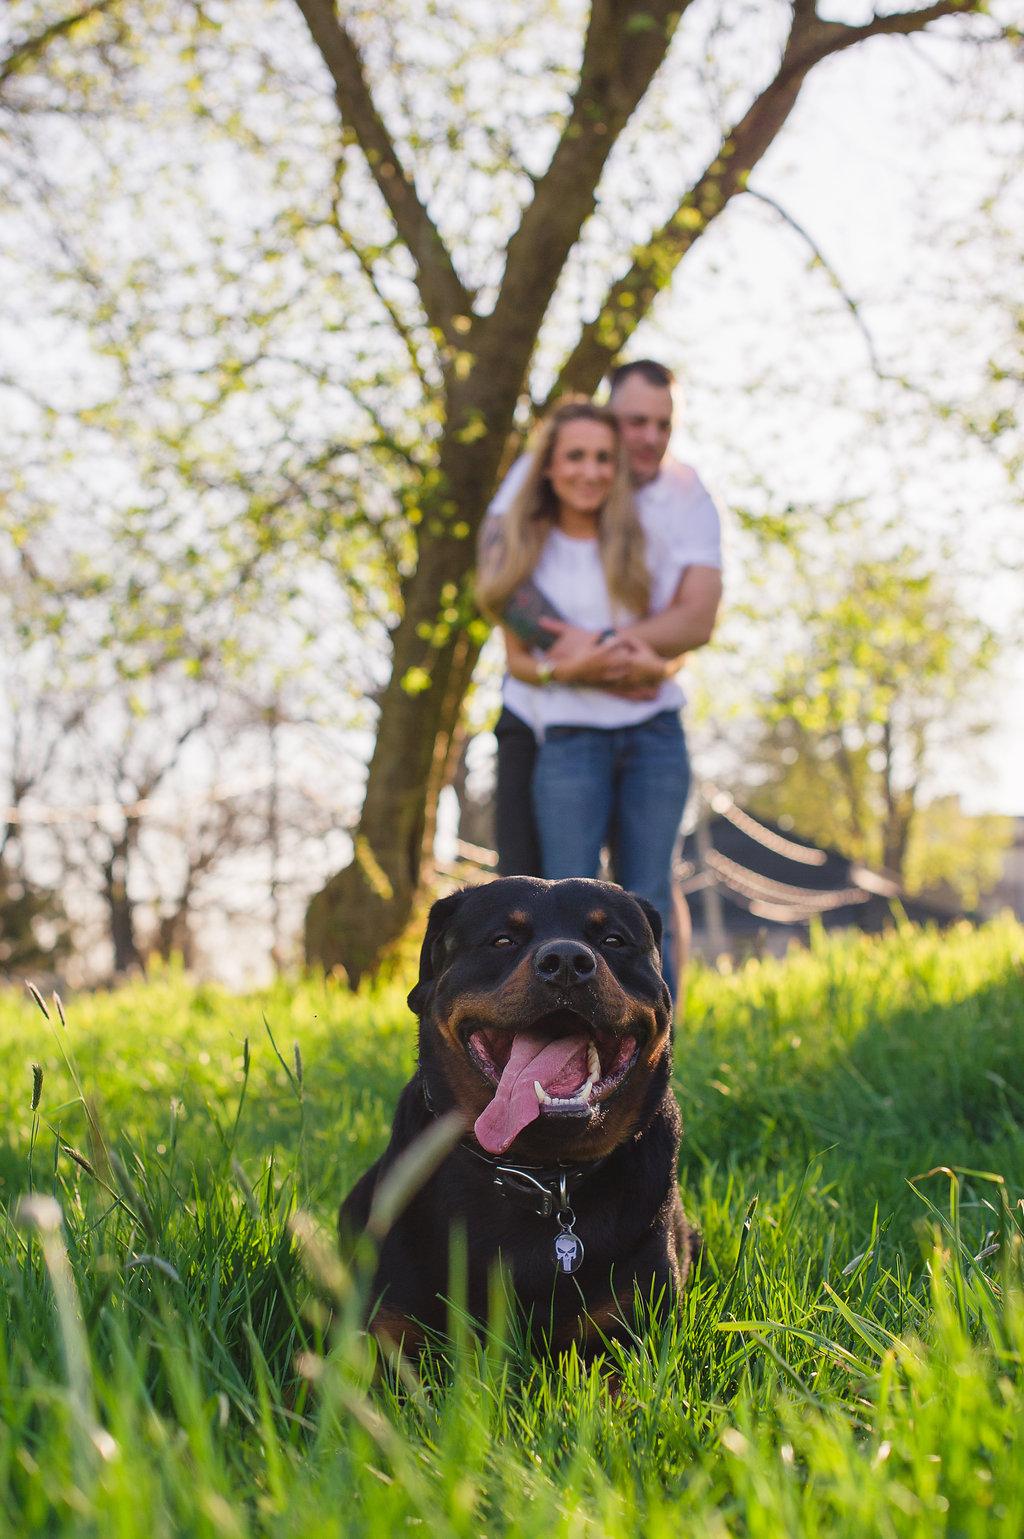 John-Jay-Homestead-Engagement-Photos-Greg-Lewis-Photography-1